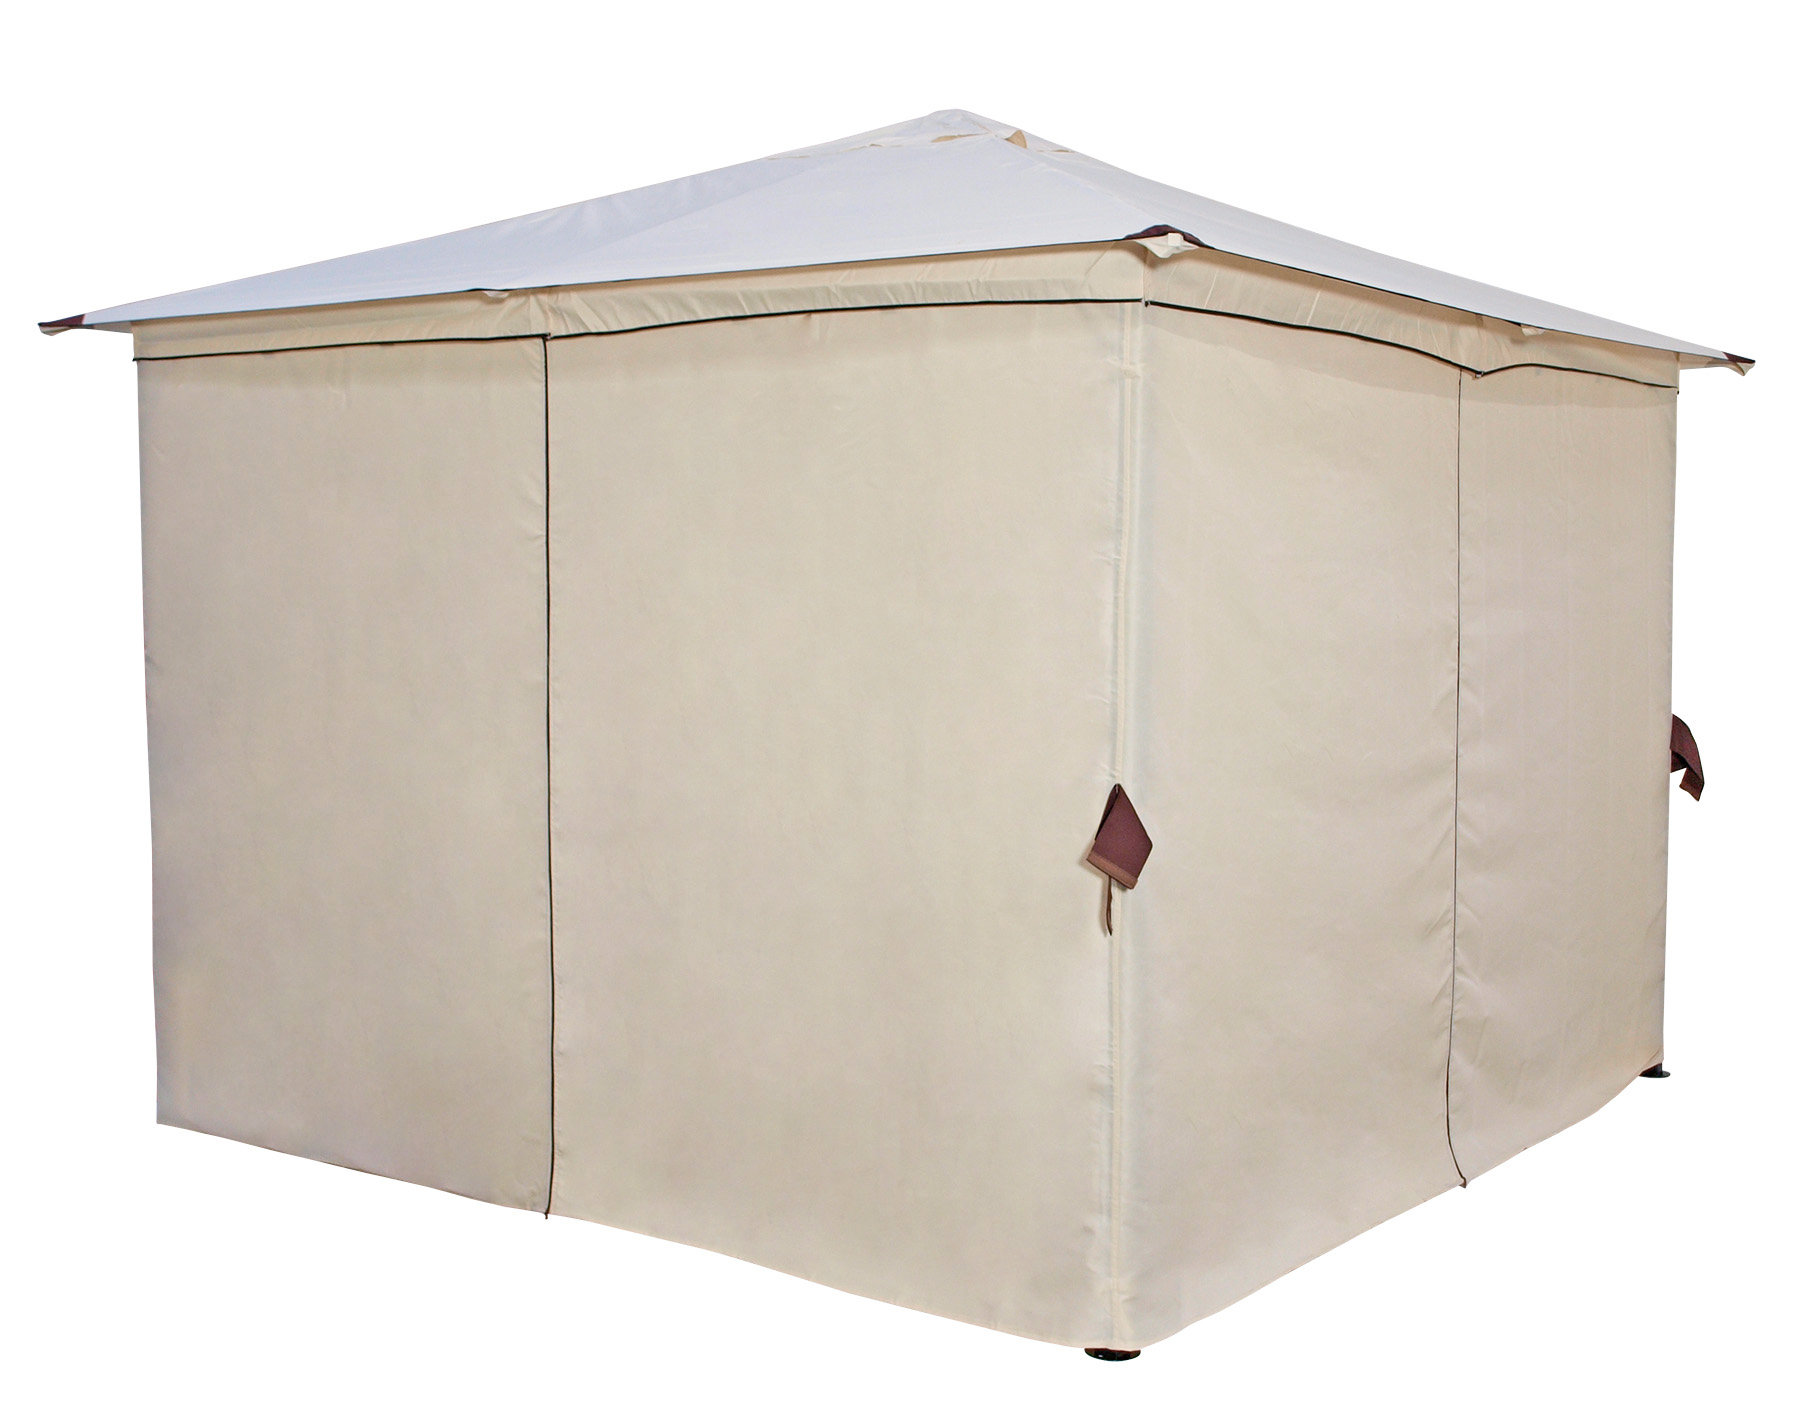 gartenpavillon pavillon metall gartenpavillion 3x3 meter venezia wasserdicht 4050747627004 ebay. Black Bedroom Furniture Sets. Home Design Ideas